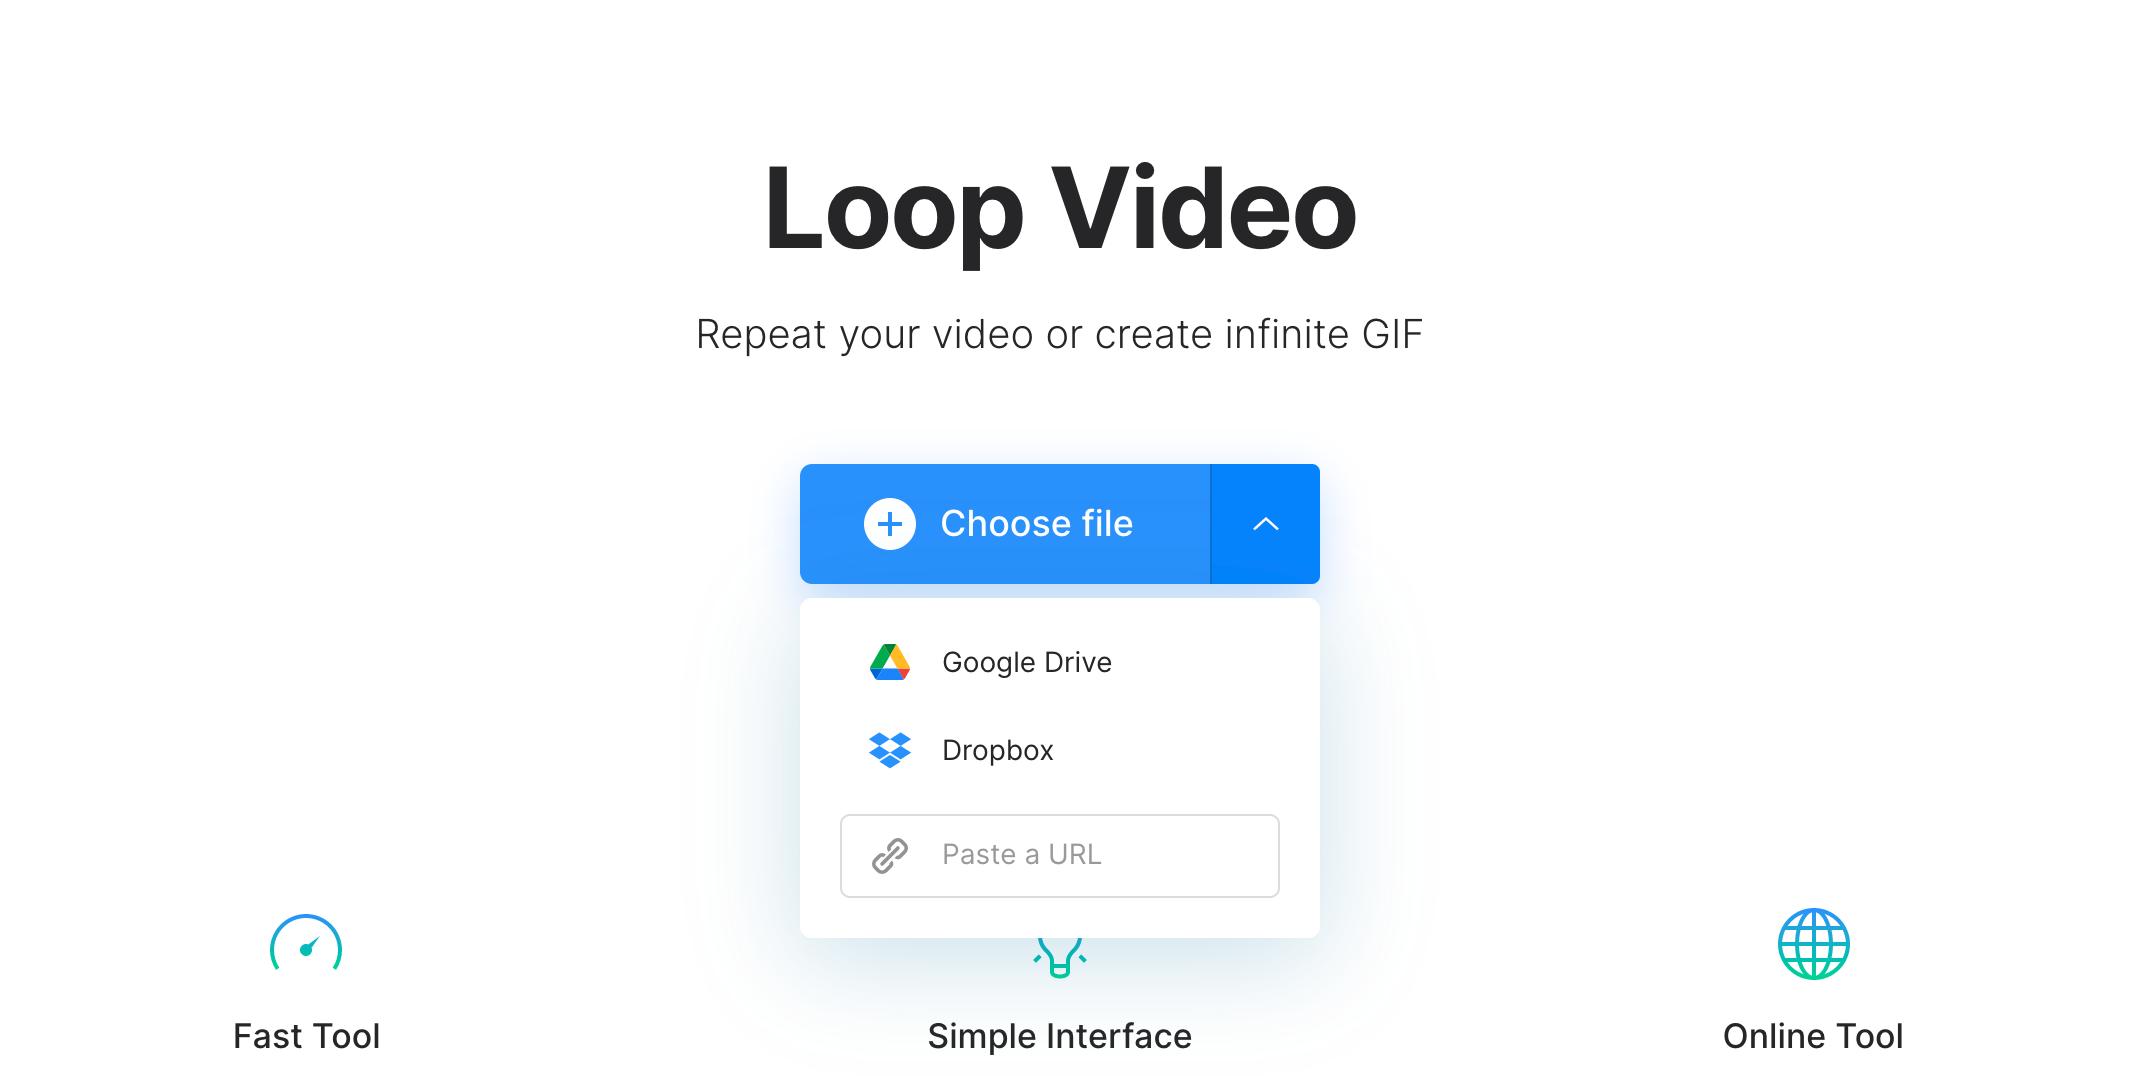 Upload YouTube video to loop